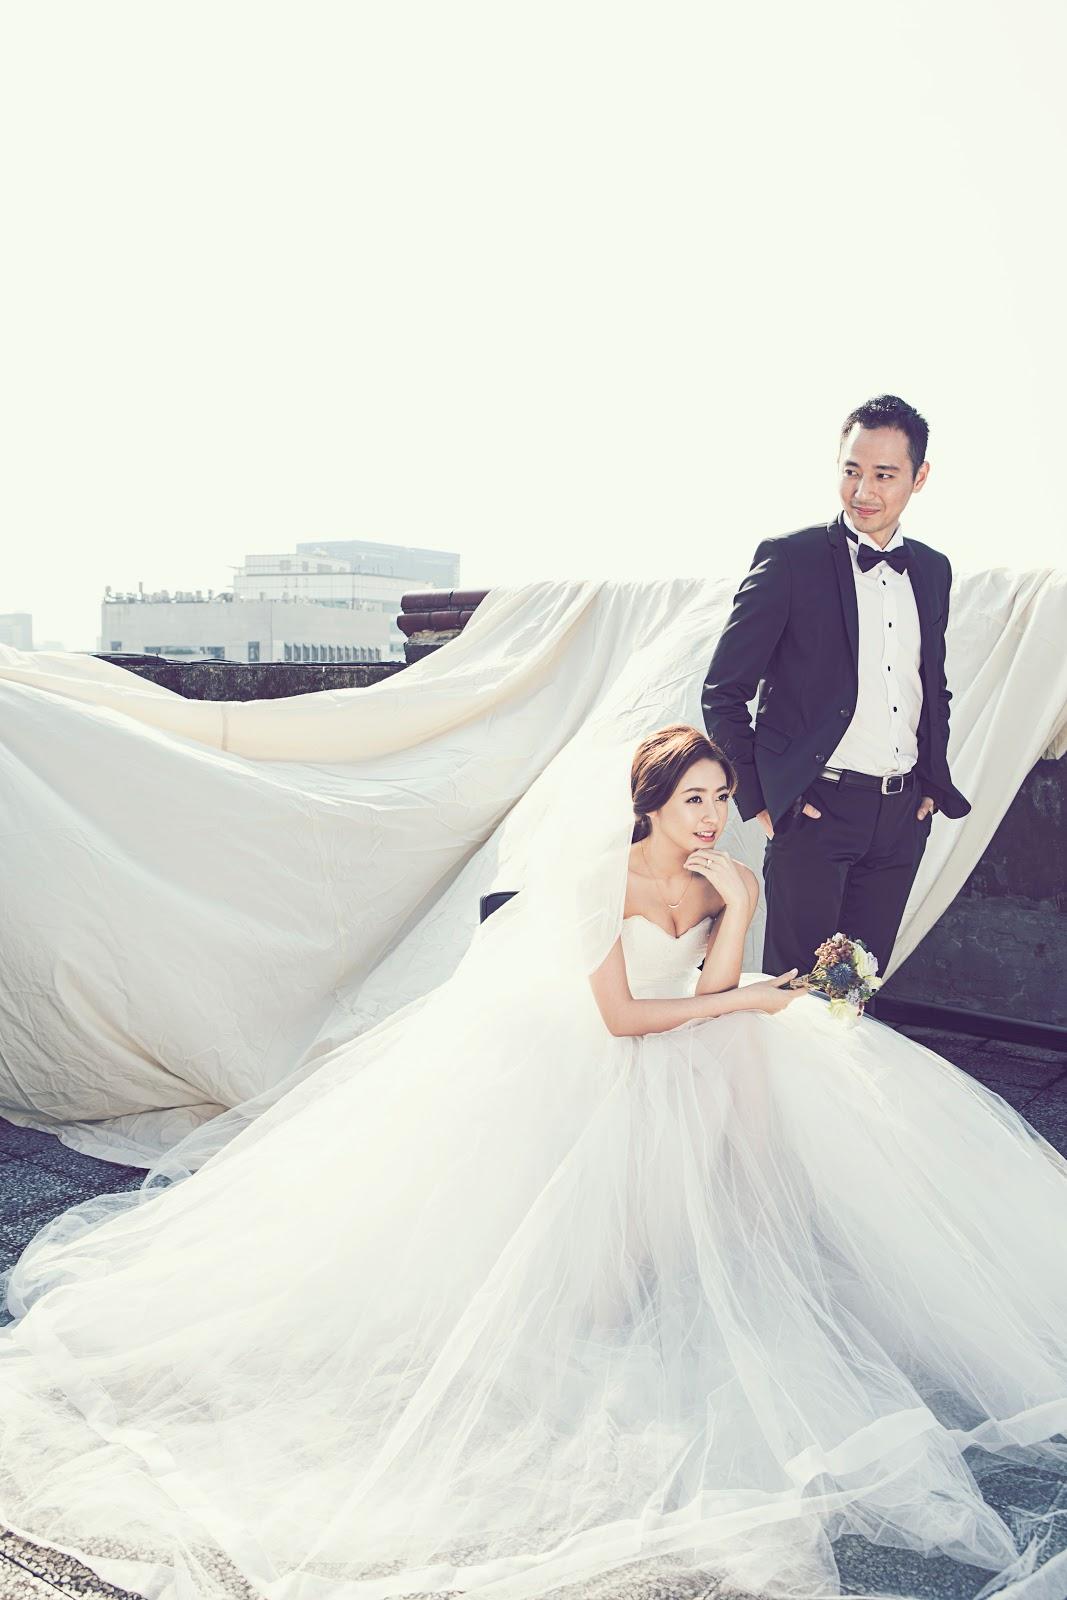 【Josf & Jill's Wedding】週年婚紗 ♥ 唯美電影風格的自助「屋頂婚紗」 - Les Femmes Co.